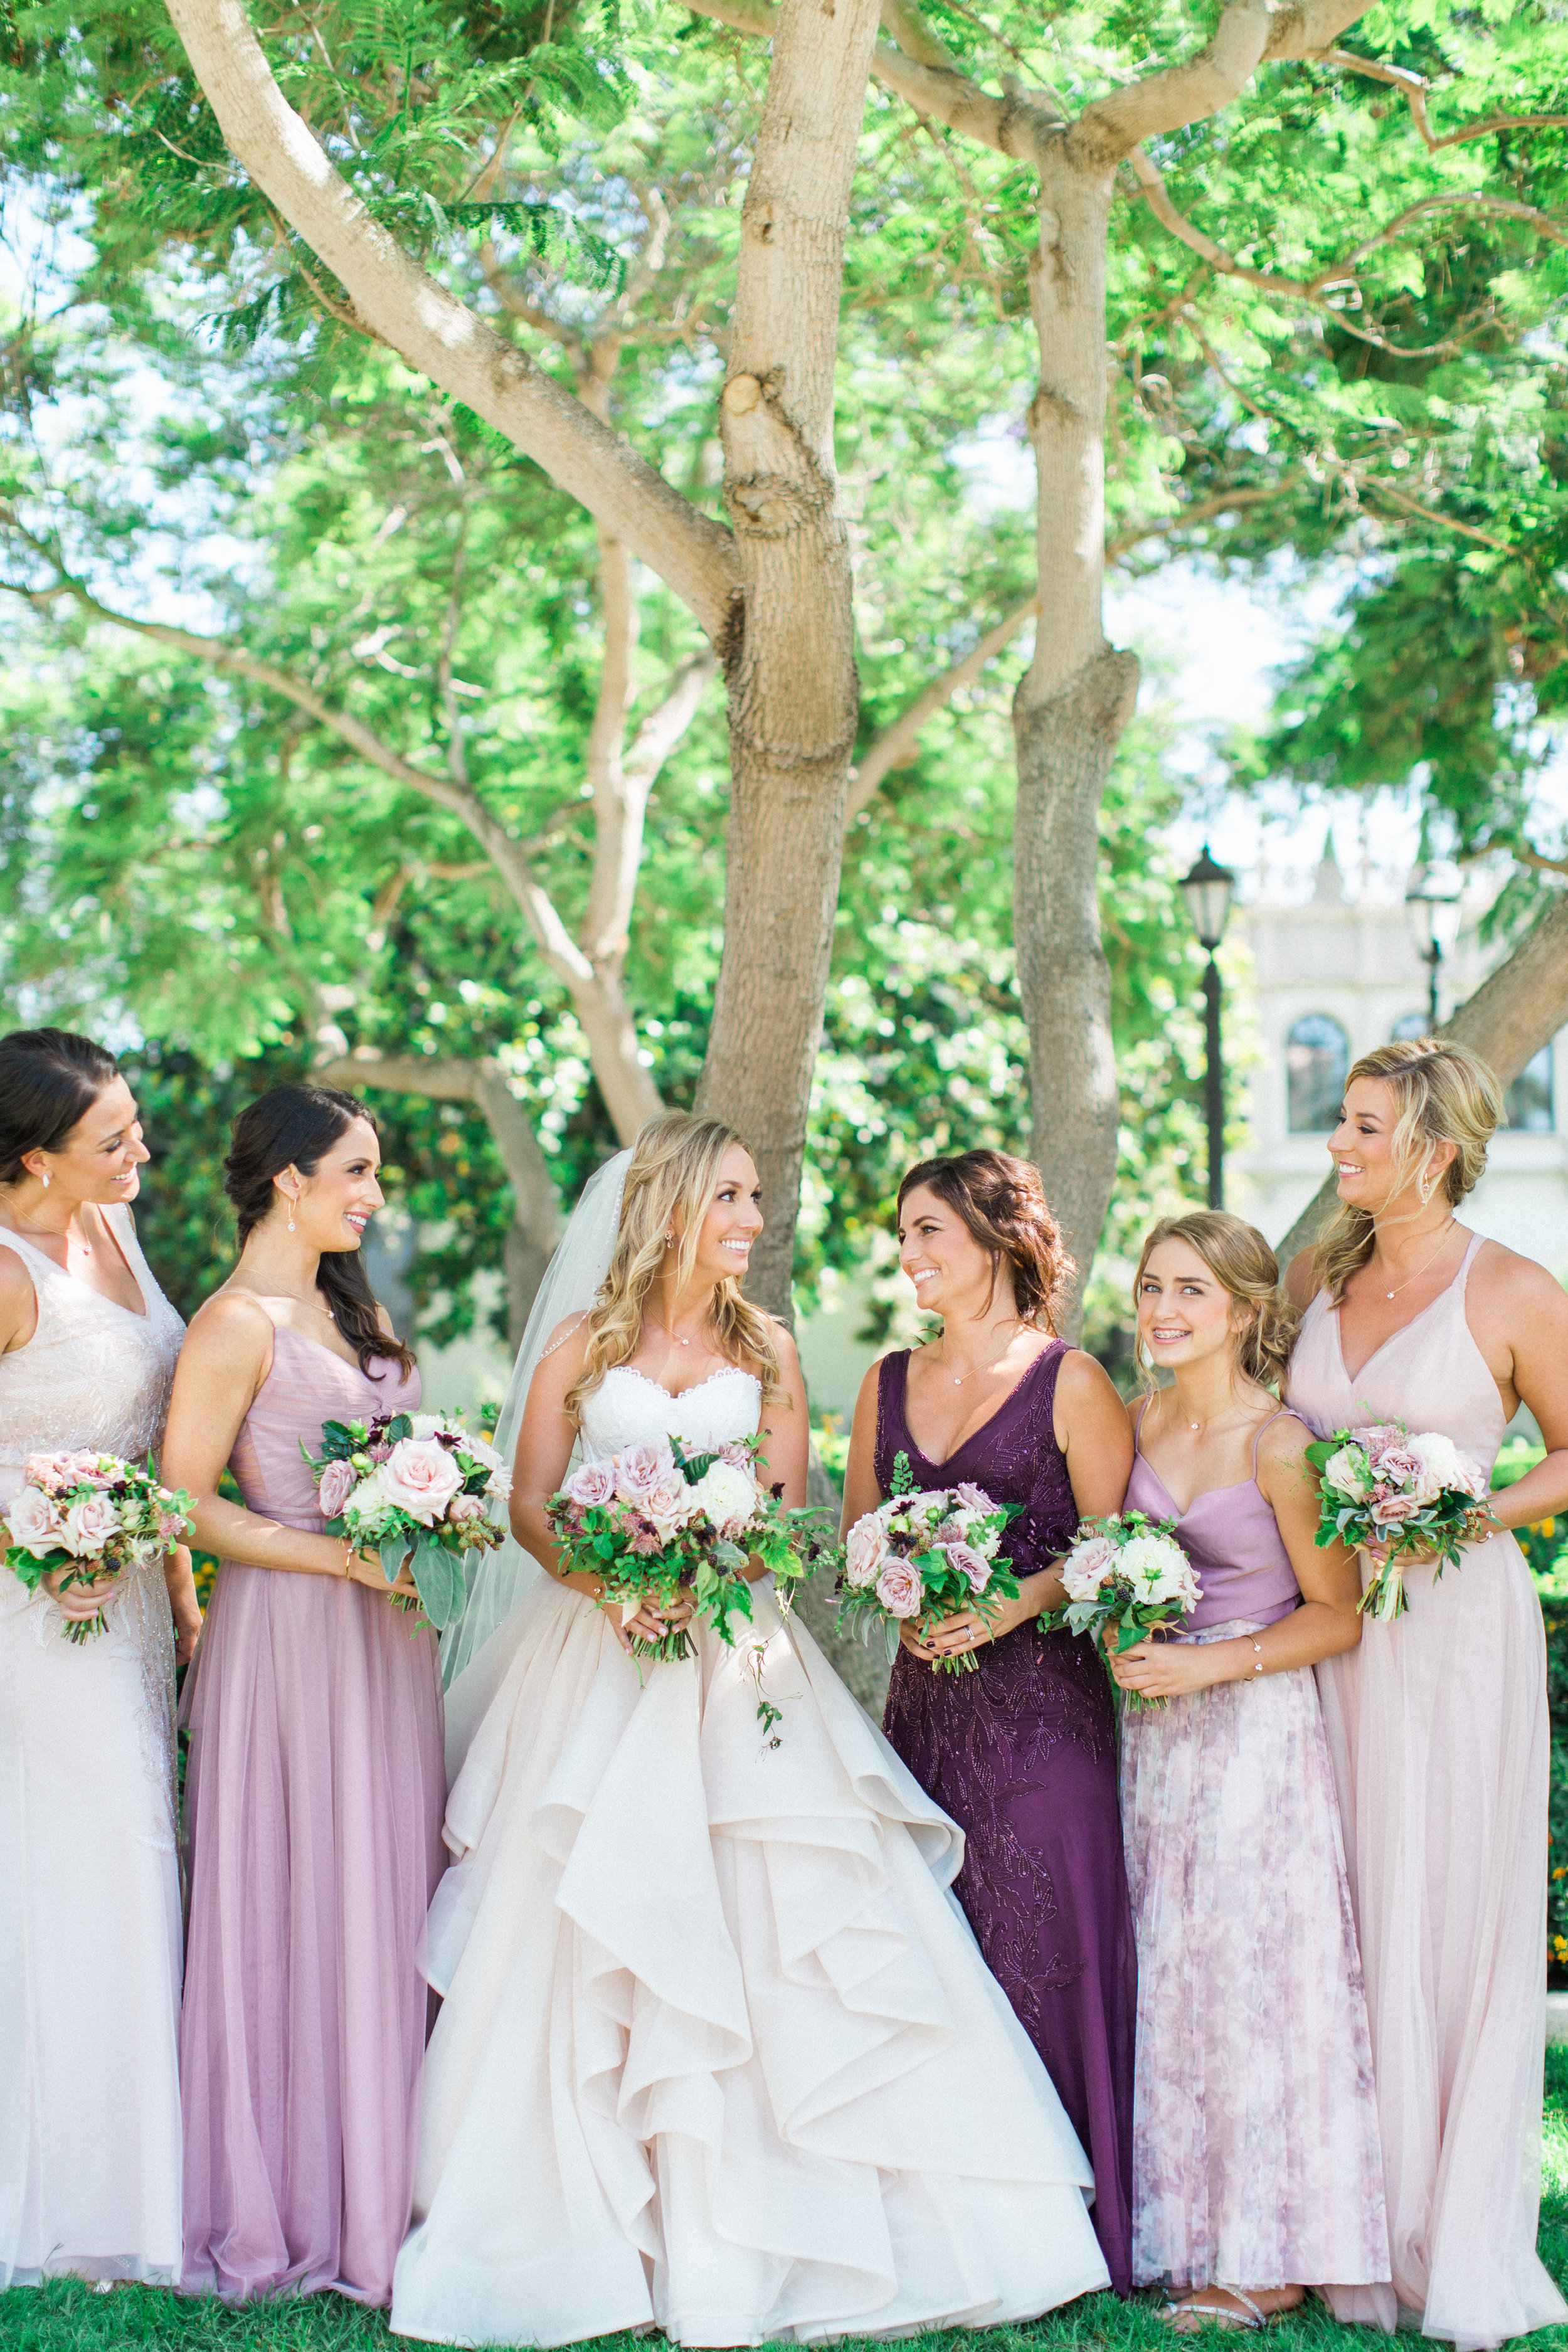 Blooms-breesa-lee-luxury-florist-aga-jones-tres-chic-affairs-san-diego-wedding-classic-coast-catering-(18).jpg